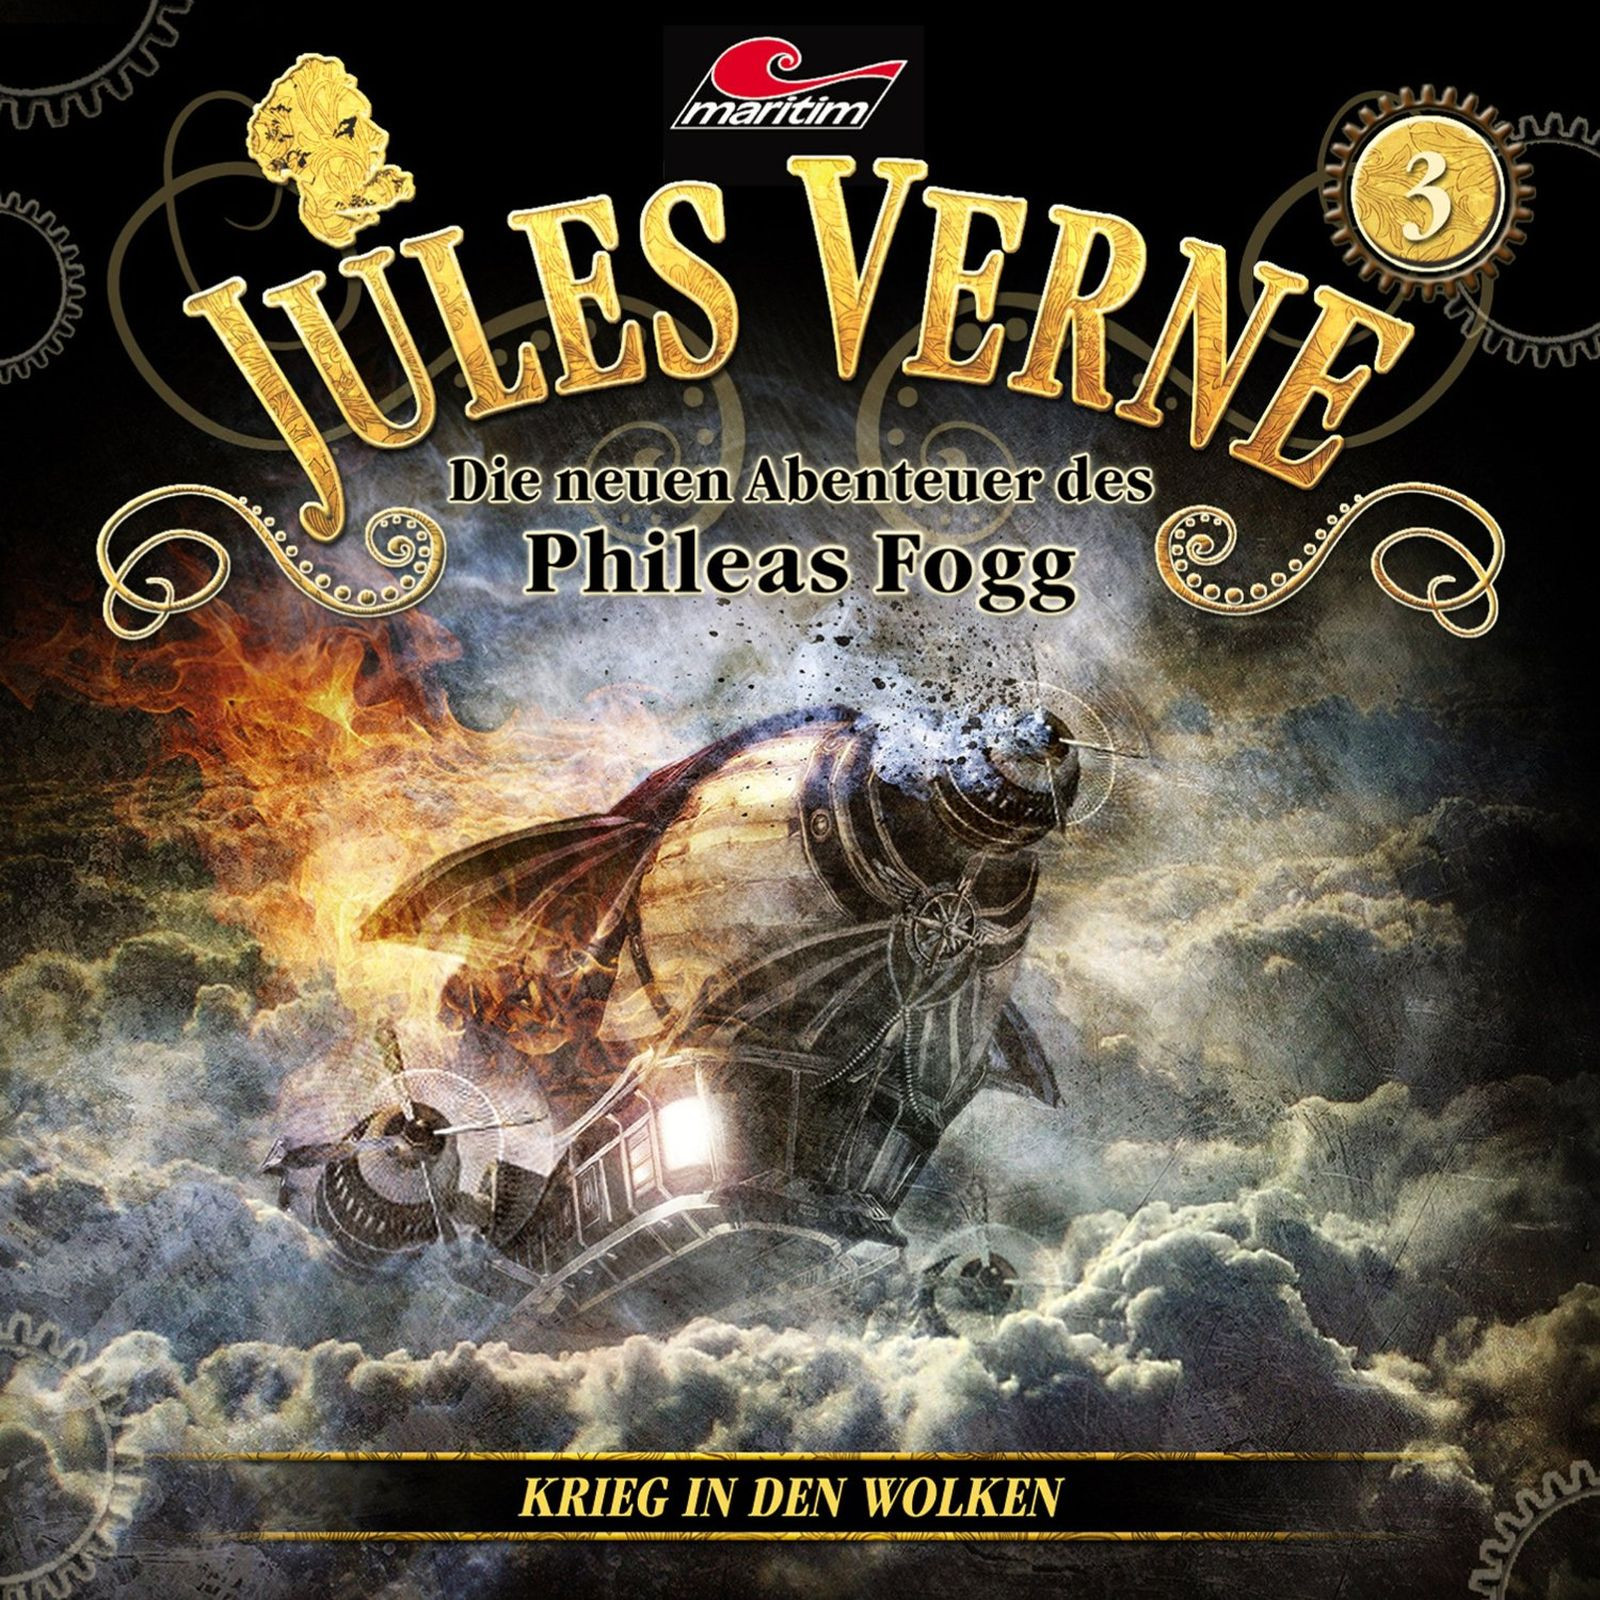 Jules Verne - Folge 3: Krieg in den Wolken